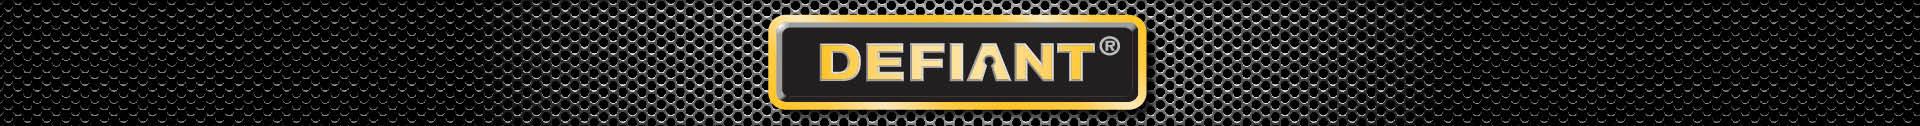 Defiant banner